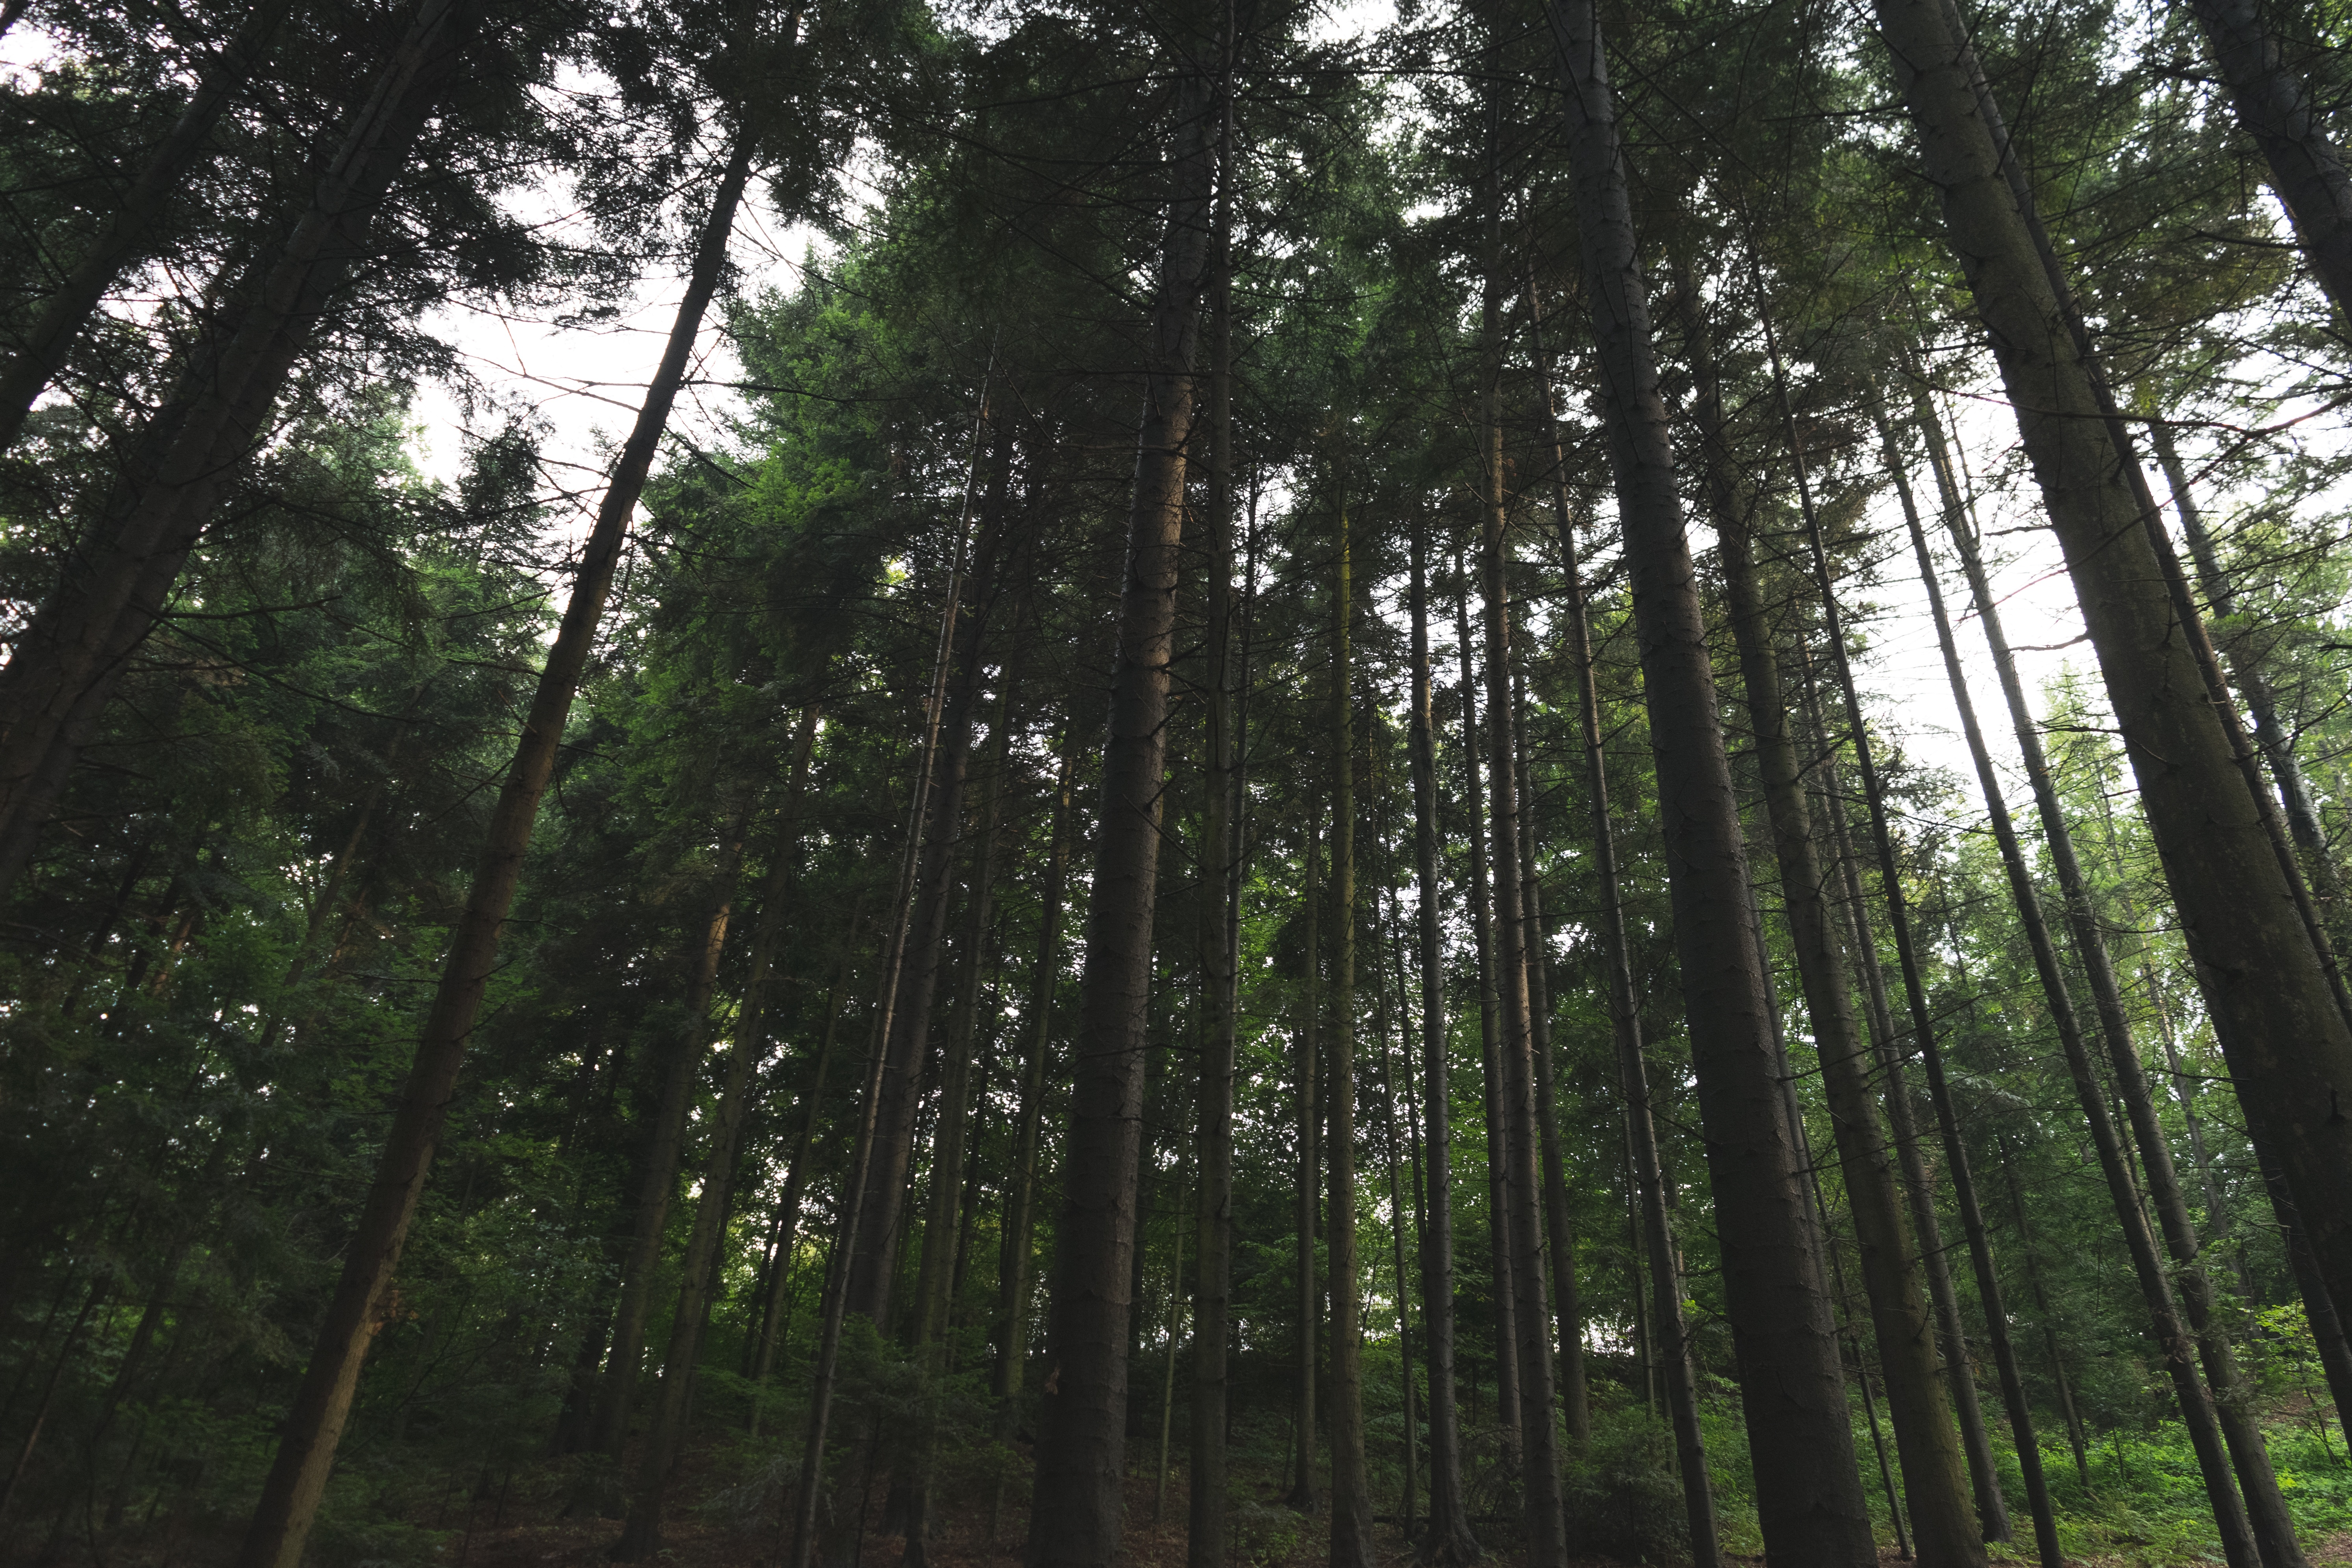 Forest, Green, Jungle, Plants, Tree, HQ Photo